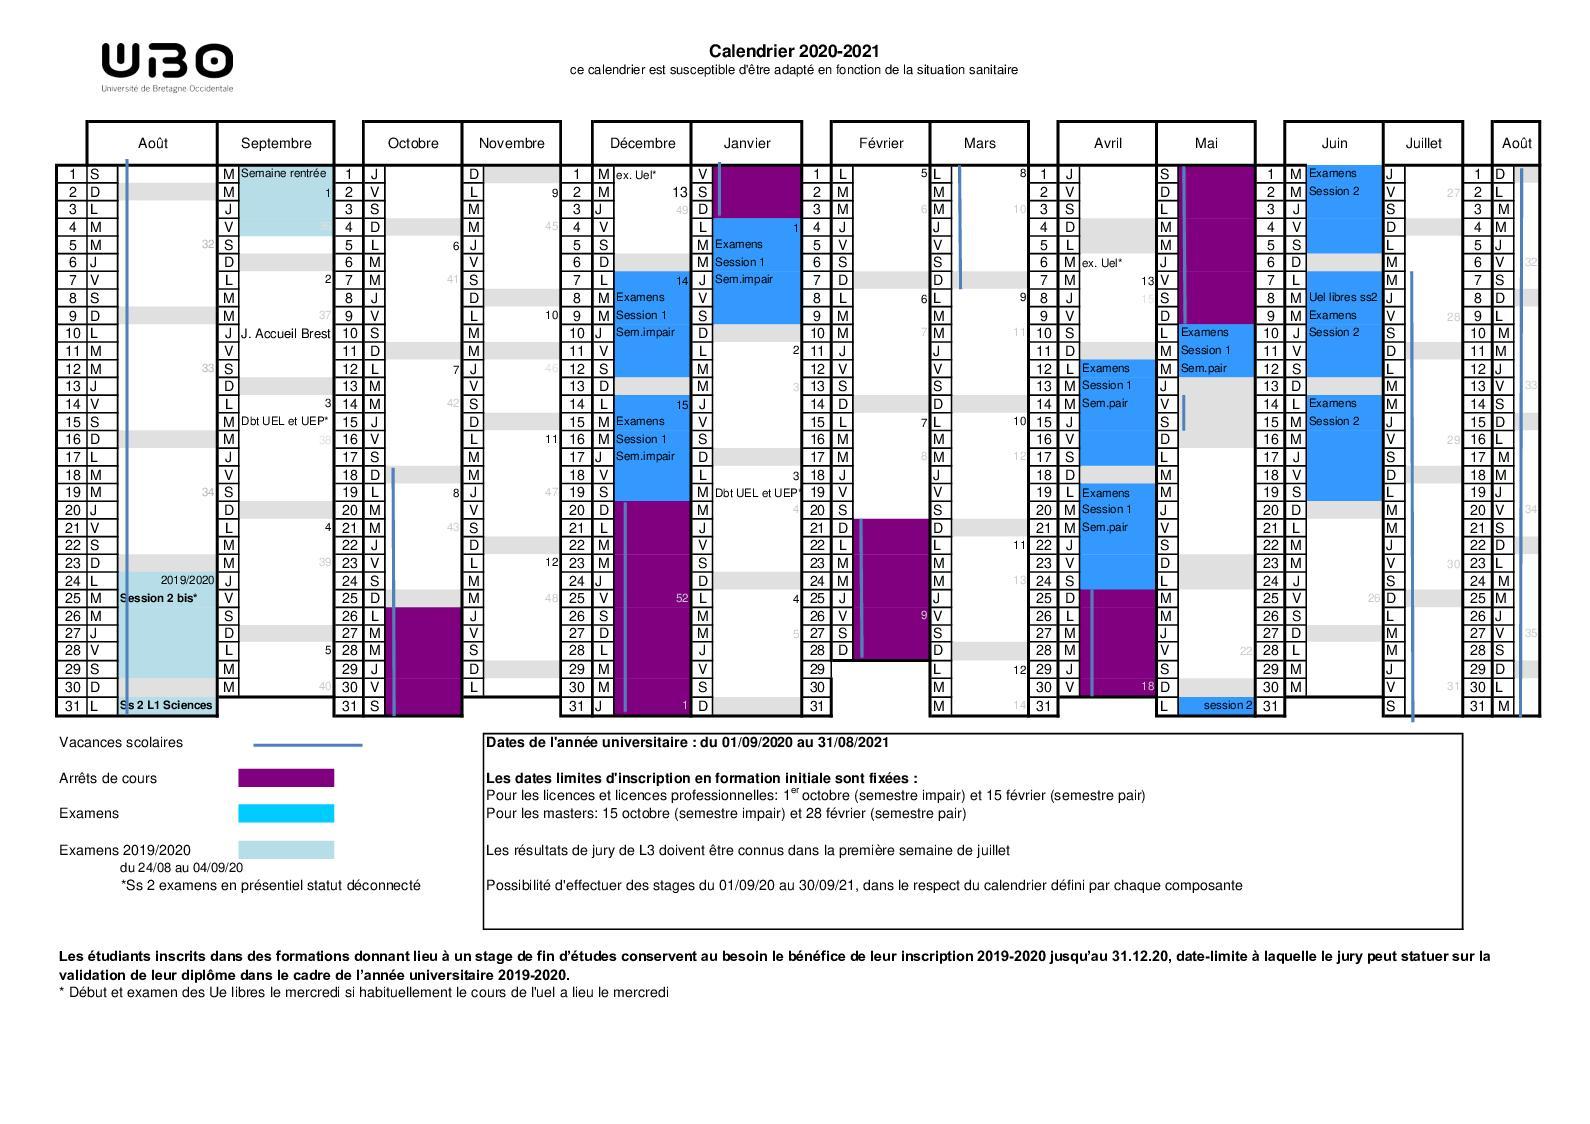 Calendrier Ubo 2021 Calaméo   Calendrier Universitaire UBO 2020 2021